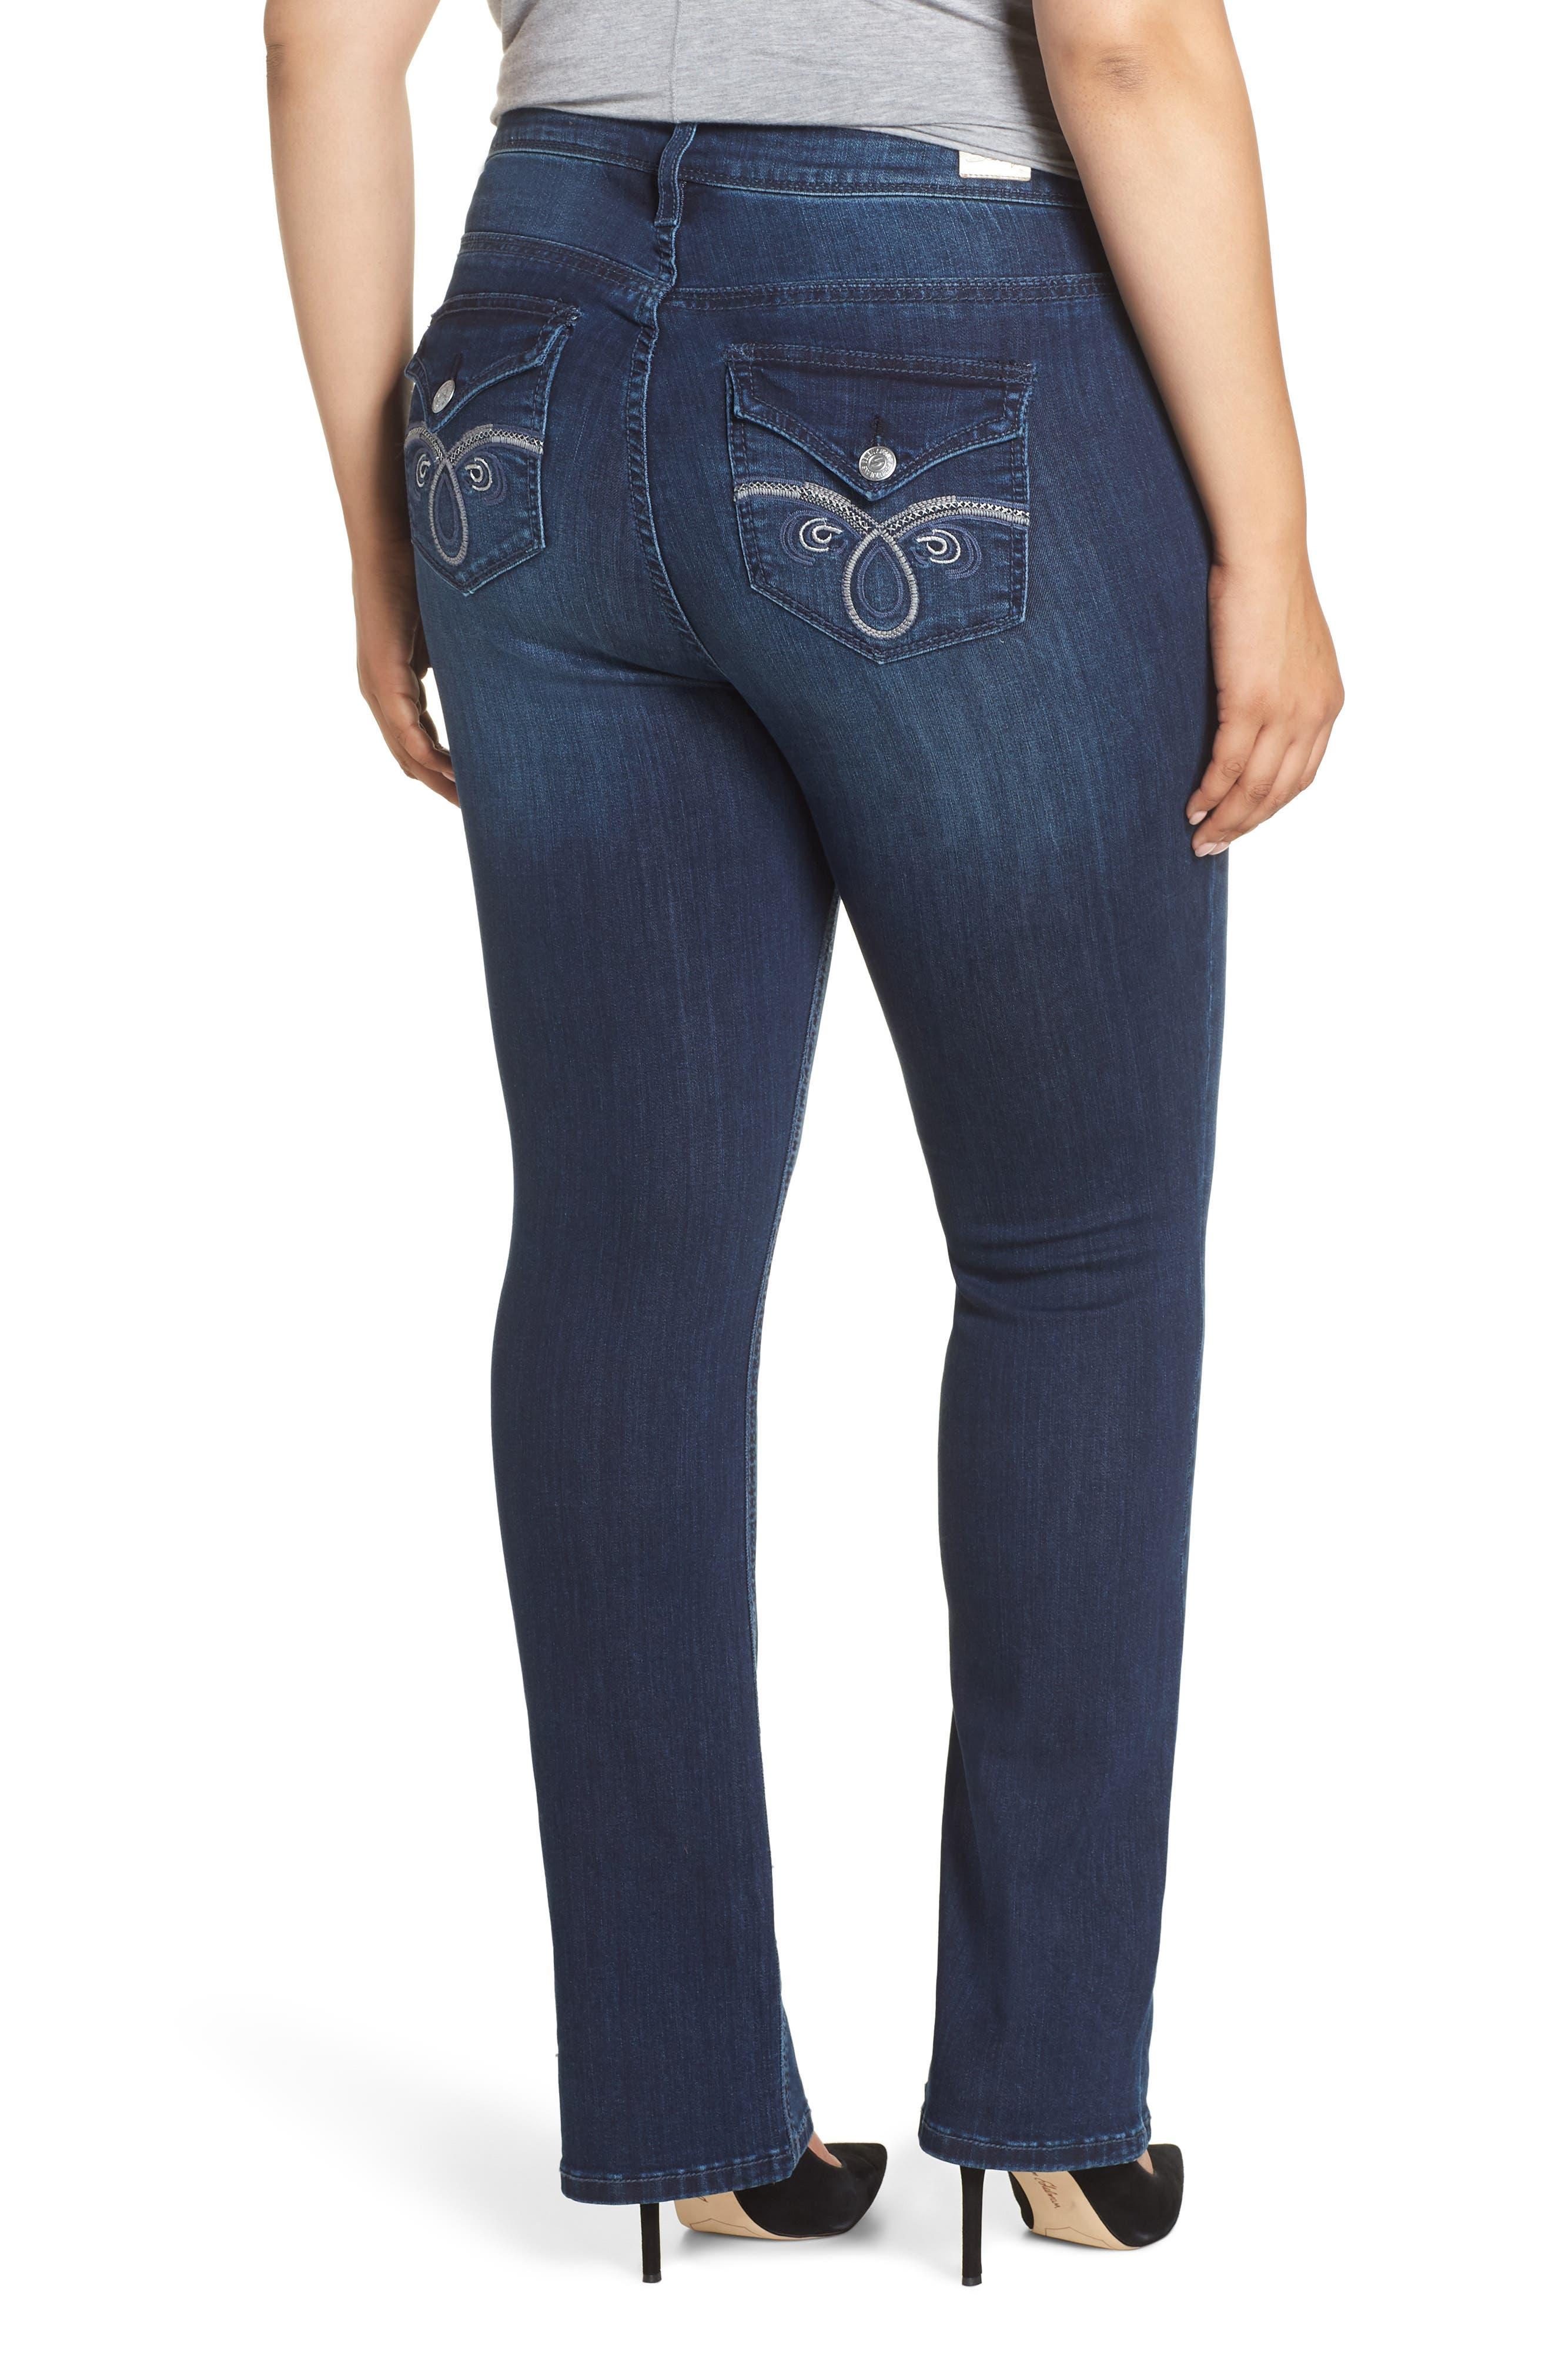 SEVEN7, Rocker Flap Pocket Slim Bootcut Jeans, Alternate thumbnail 2, color, CHALLENGER